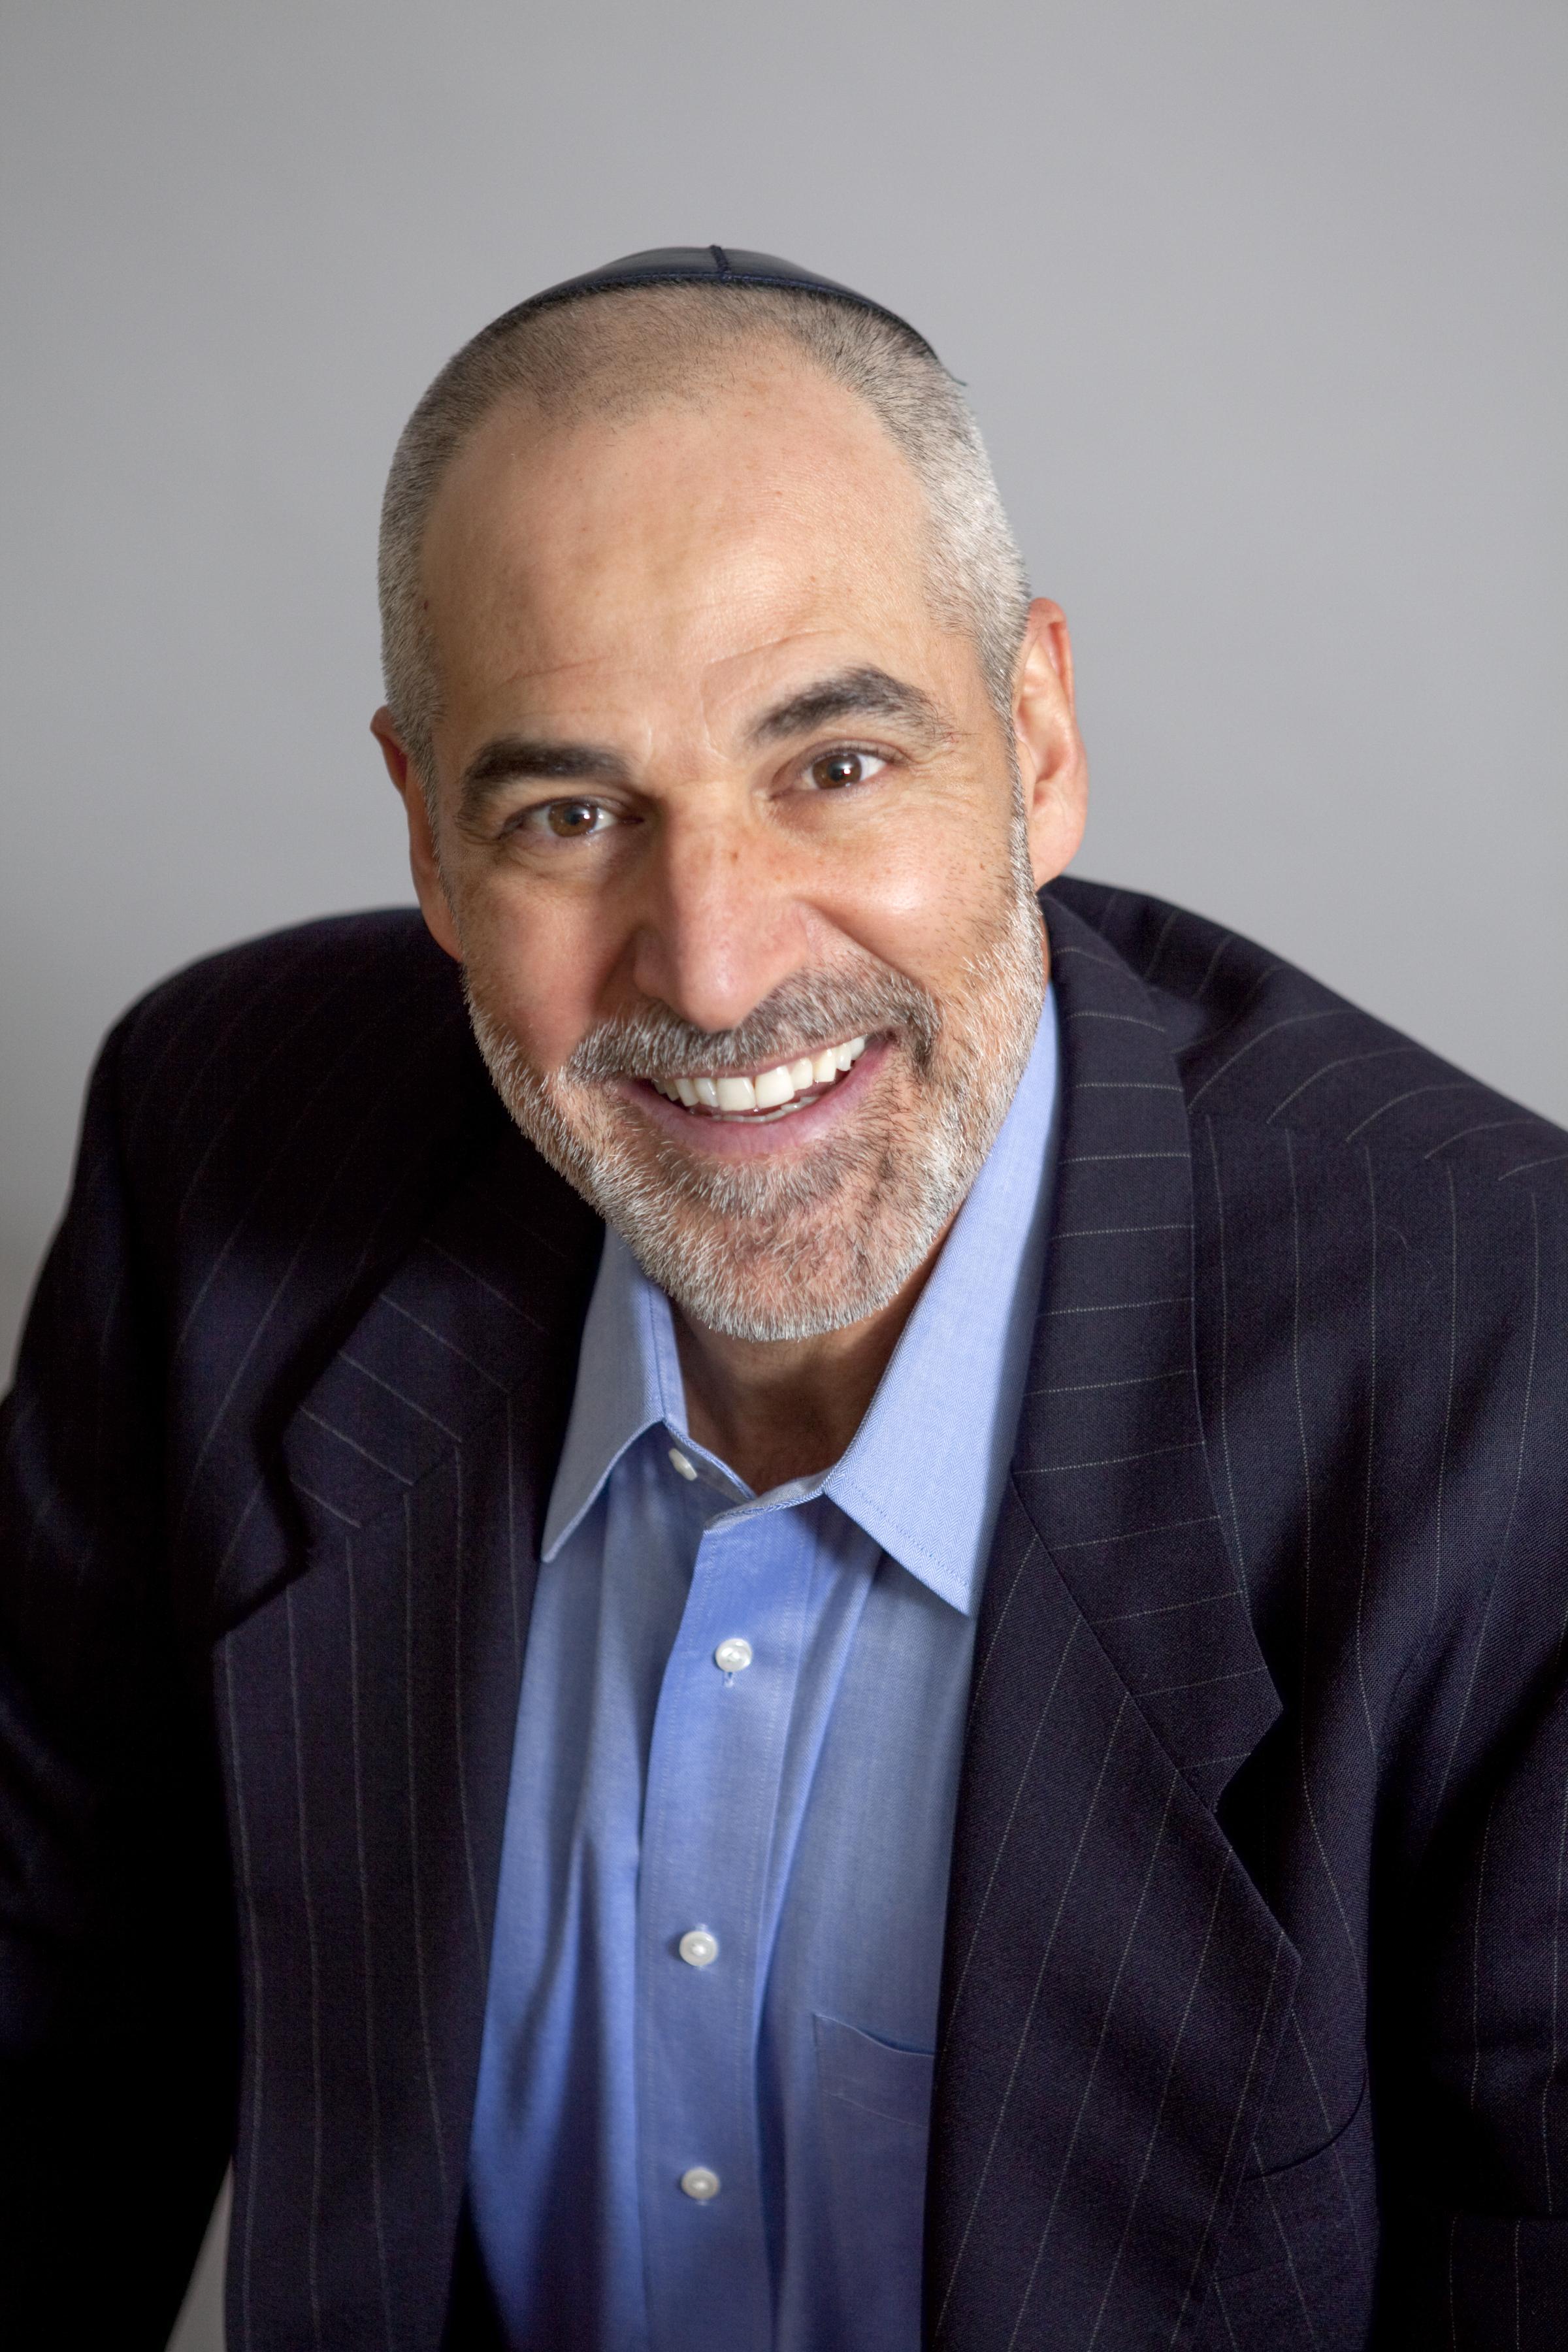 Hr Jobs In Dallas >> Alan Veingrad: the journey to Shlomo - Crescent City Jewish News Crescent City Jewish News